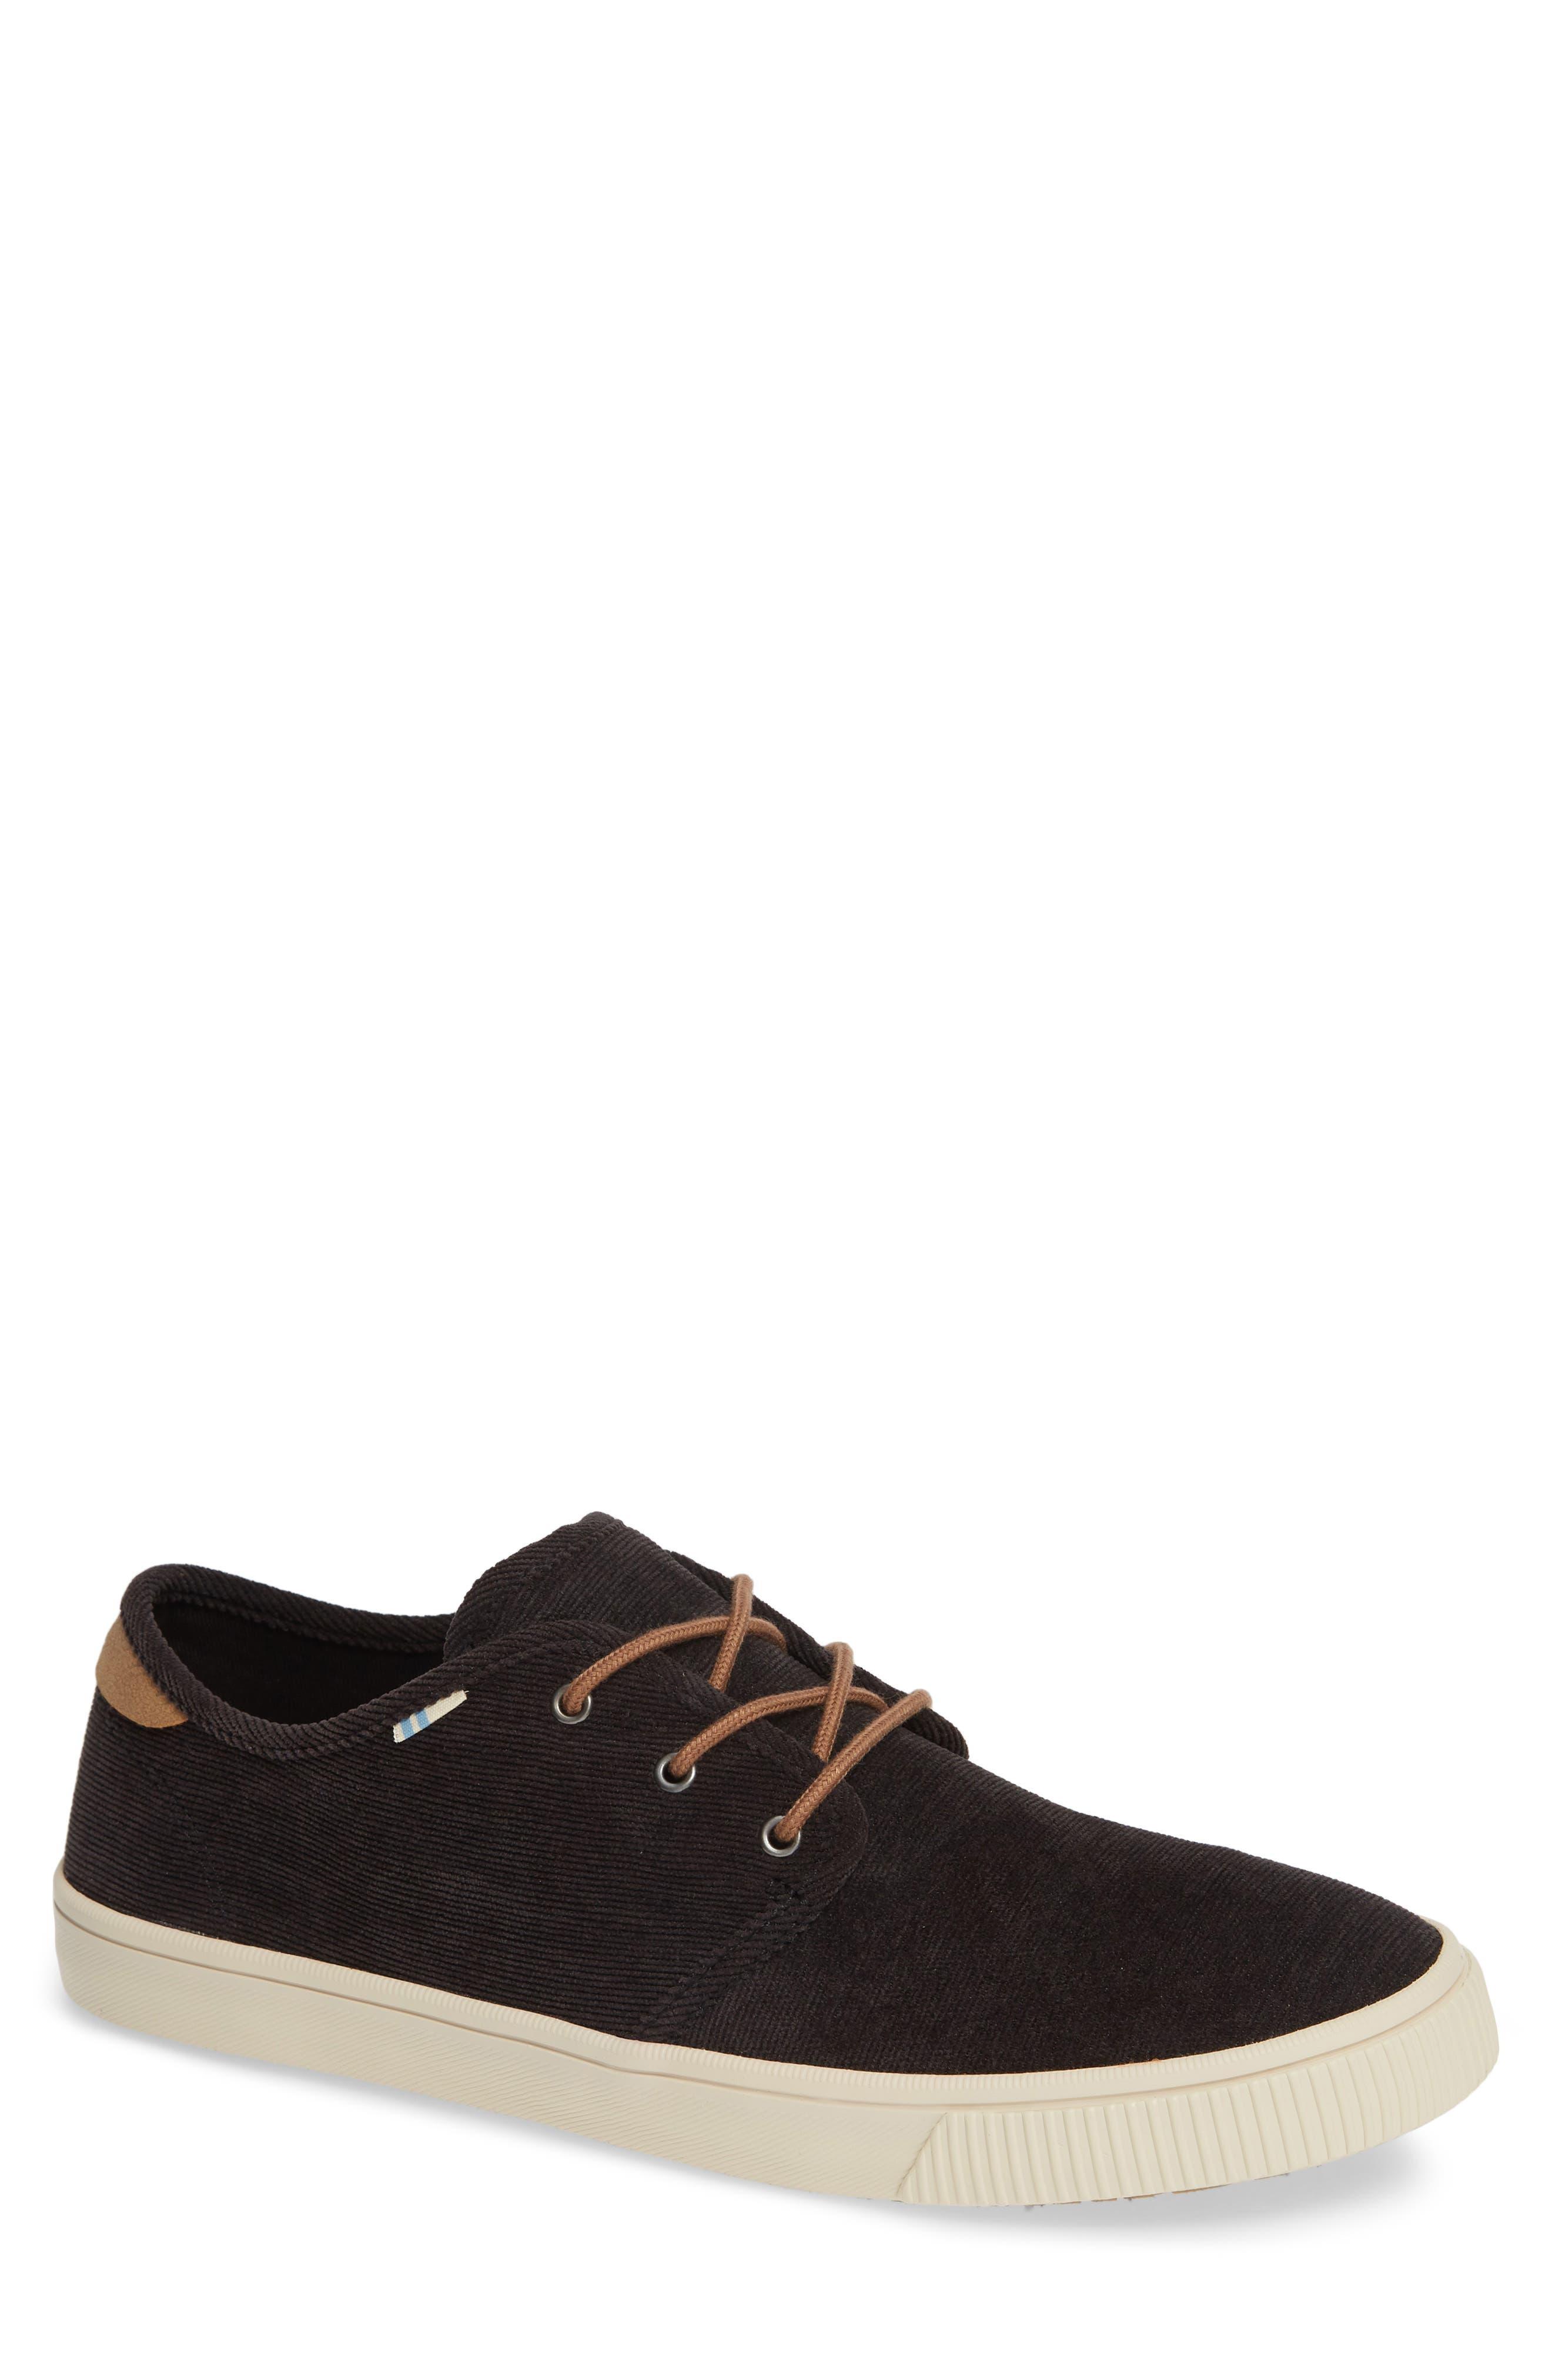 Carlo Sneaker,                             Main thumbnail 1, color,                             BLACK